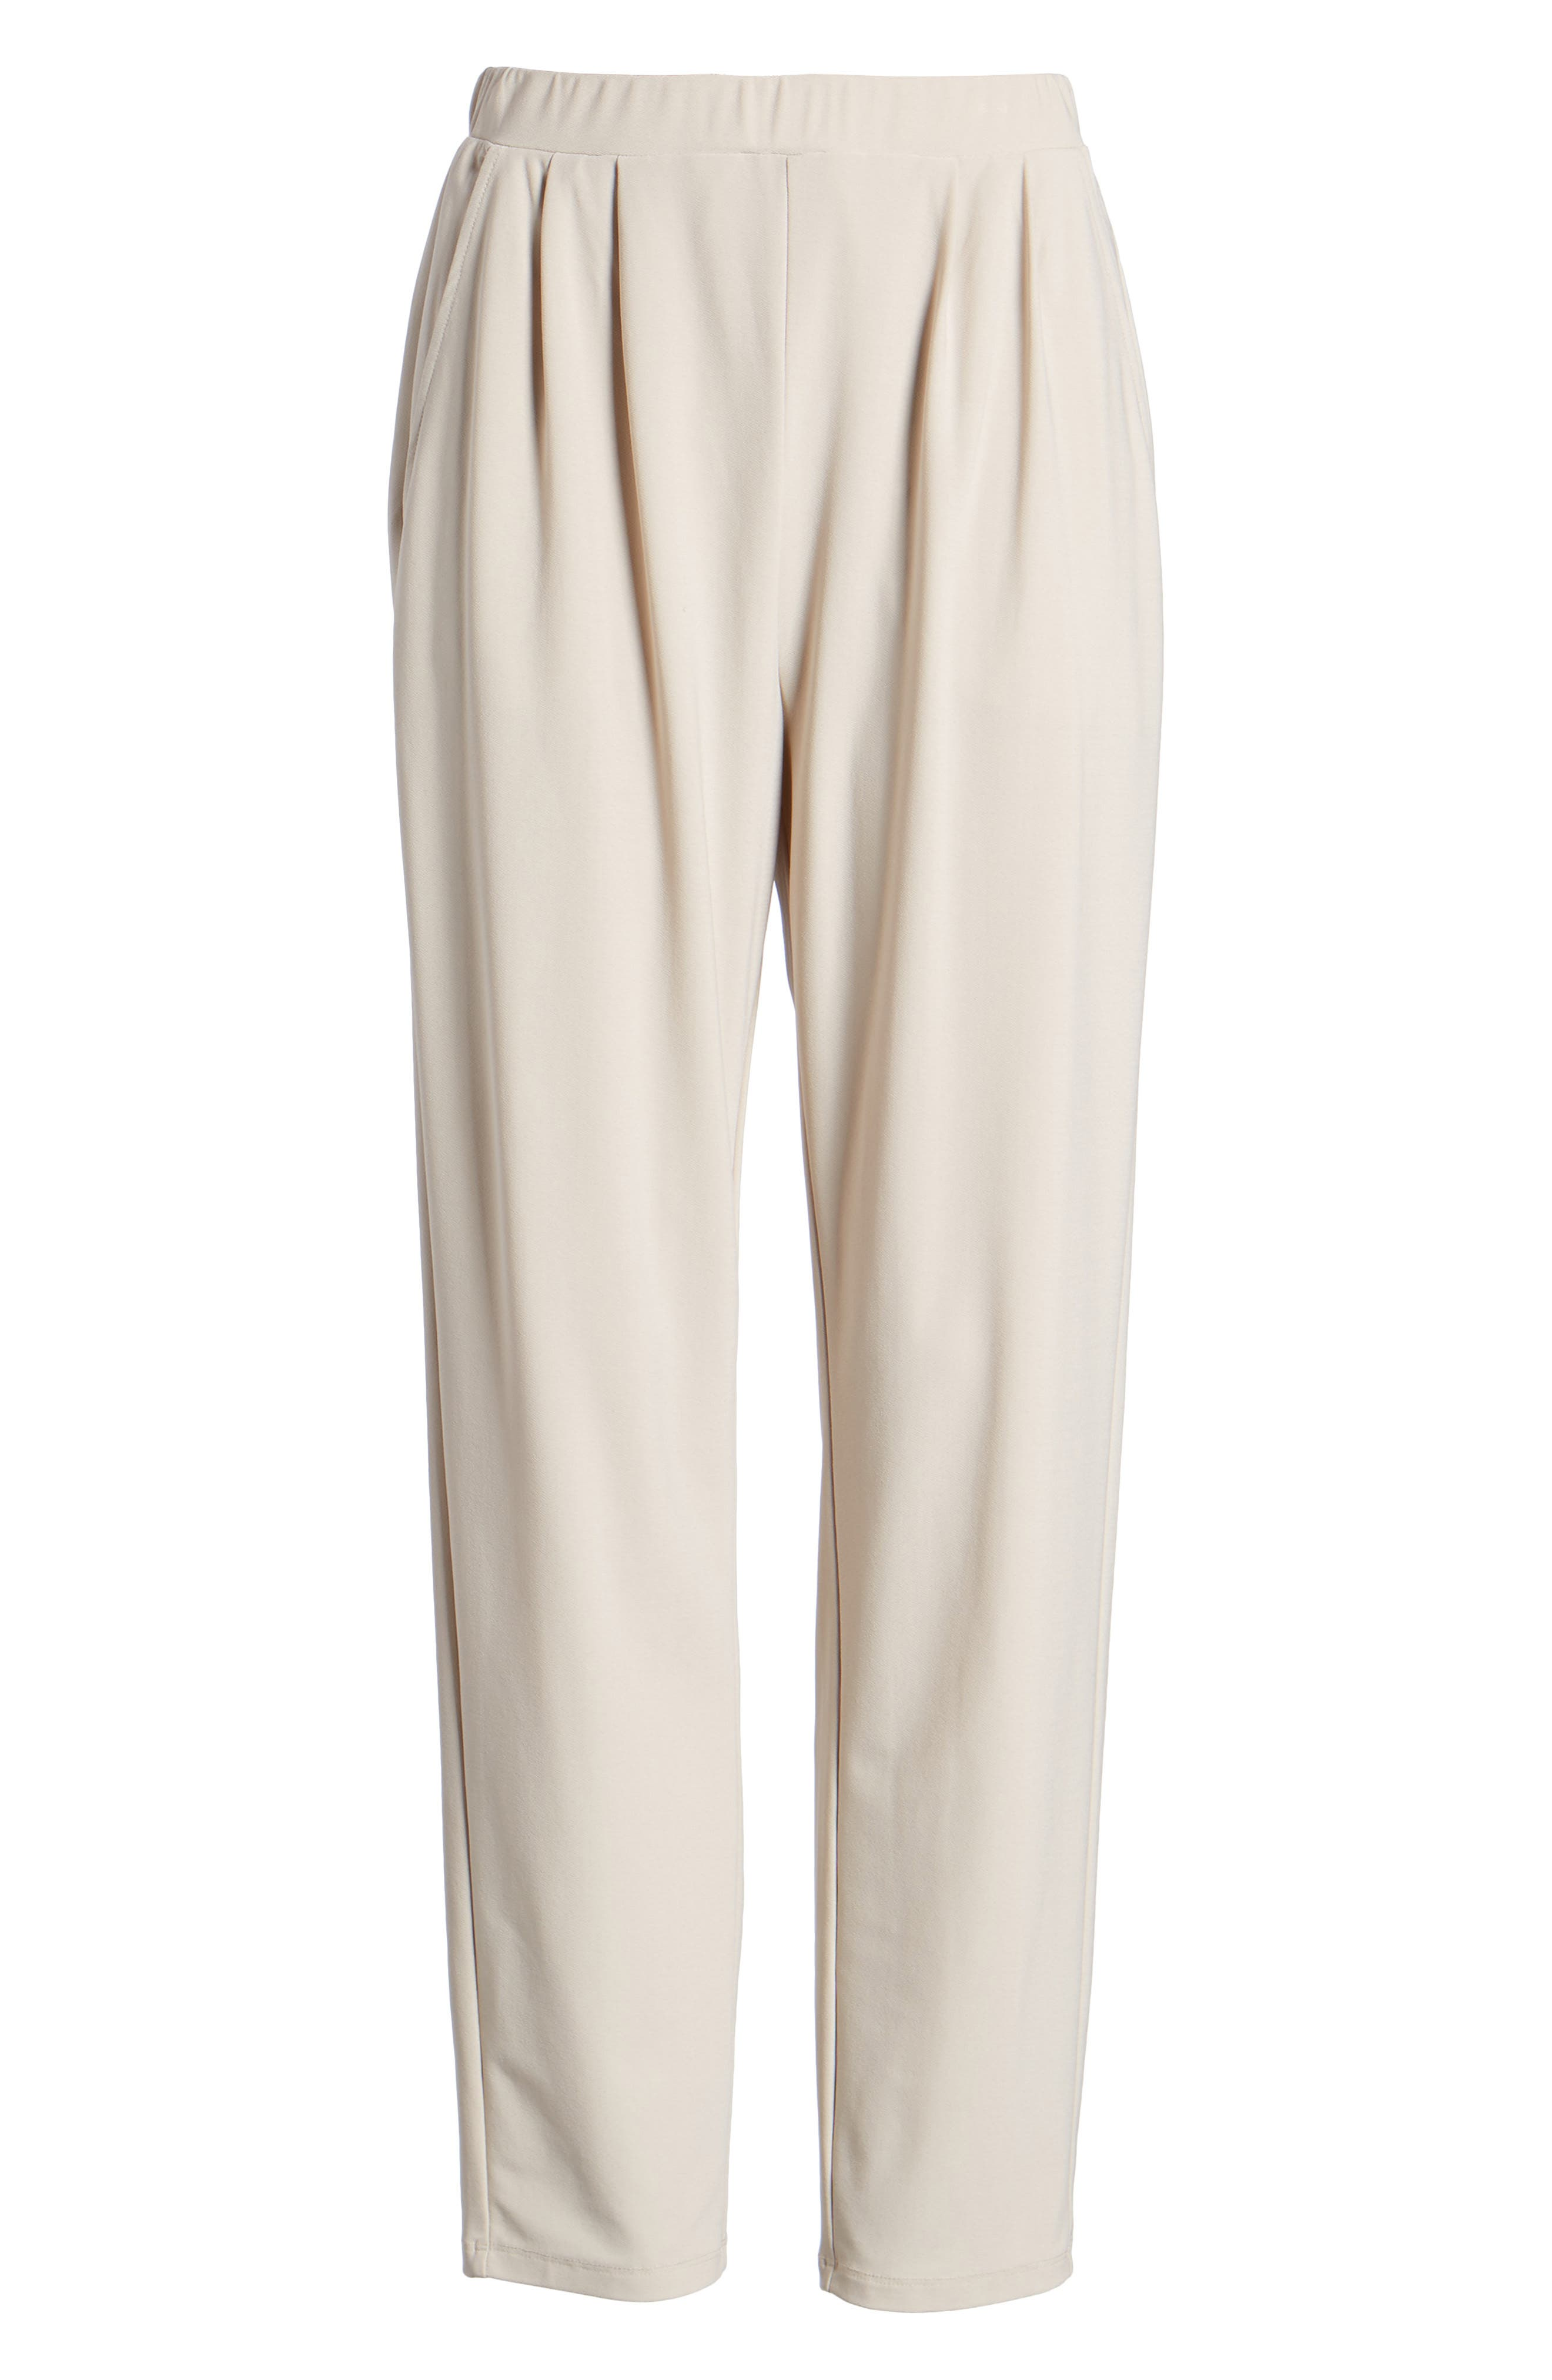 Pleat Front Trousers,                             Alternate thumbnail 7, color,                             Beige Morn